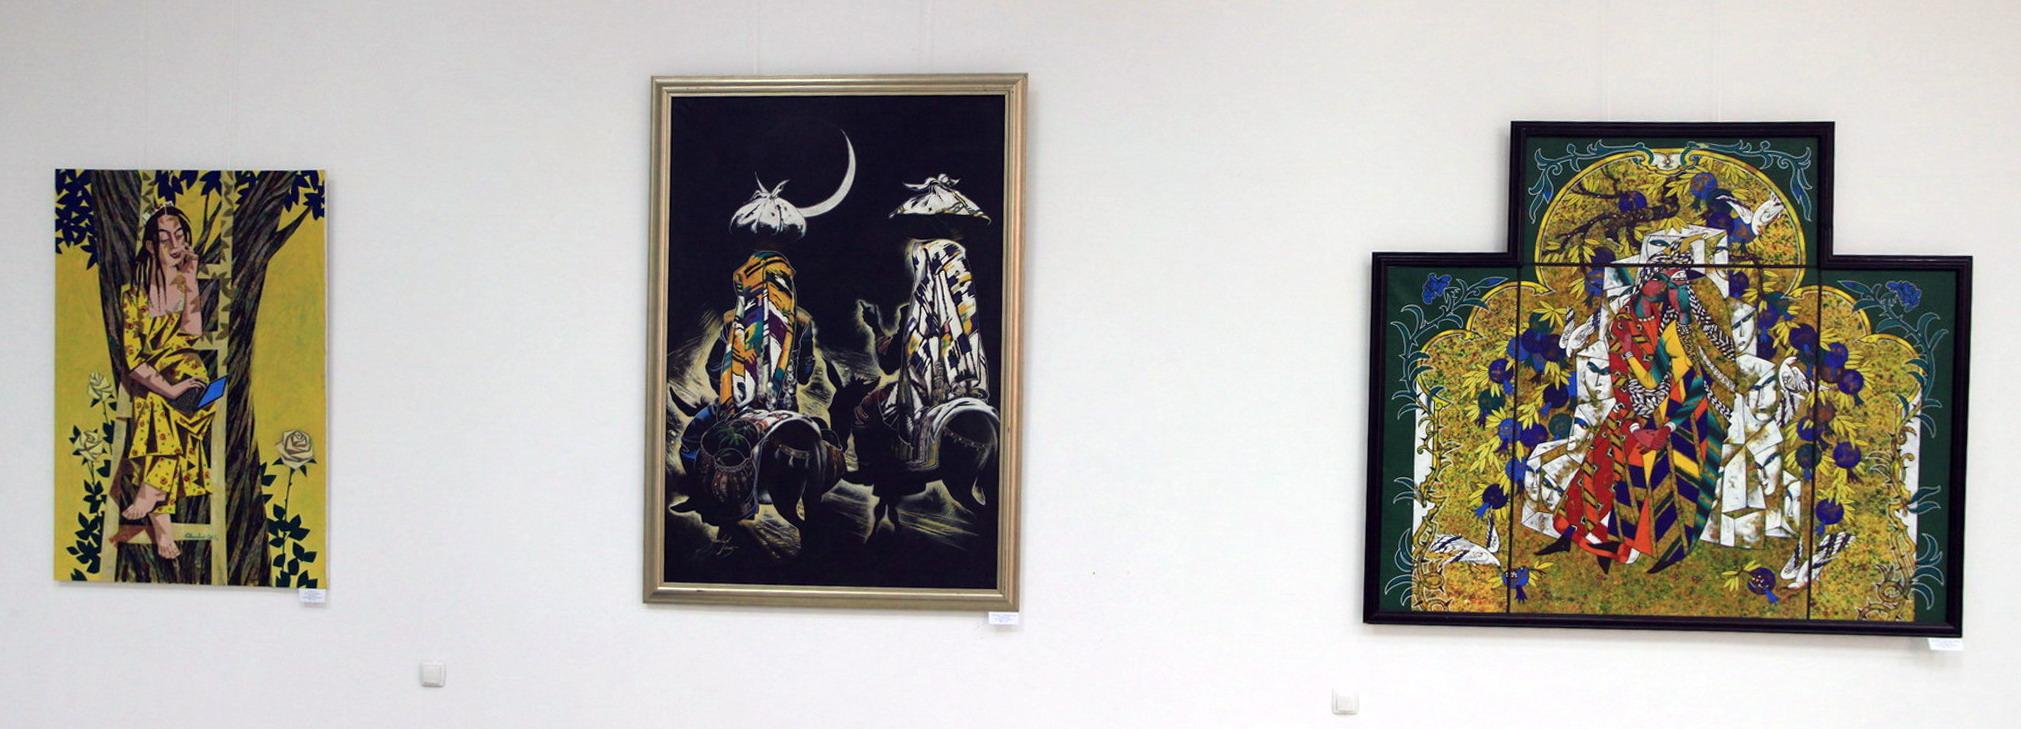 Экспозиция картин Х. Зияханова и Ж. Умарбекова